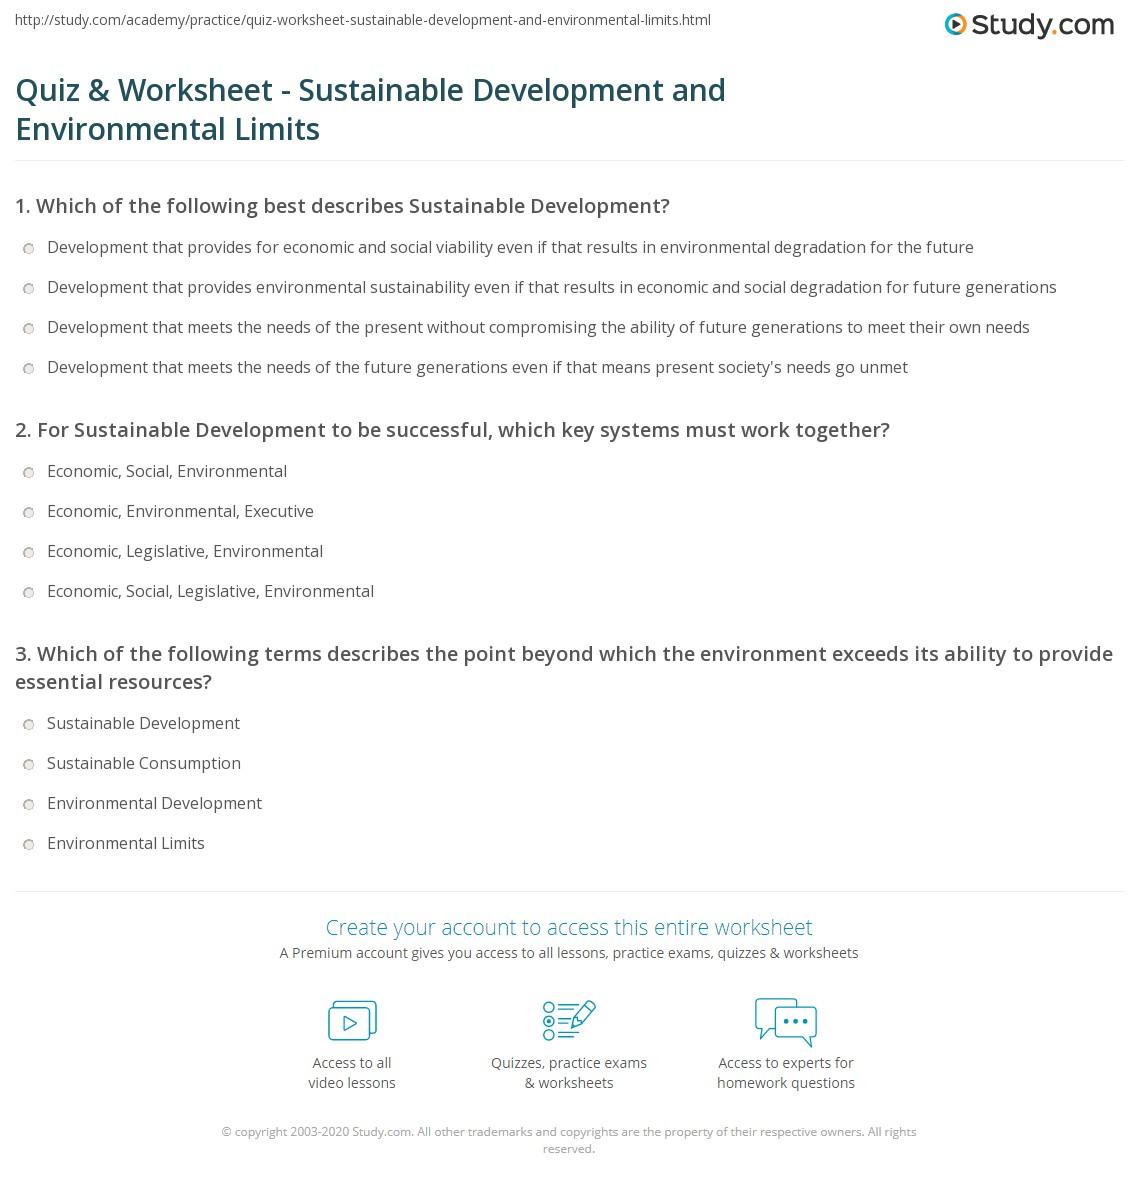 Quiz & Worksheet Sustainable Development and Environmental